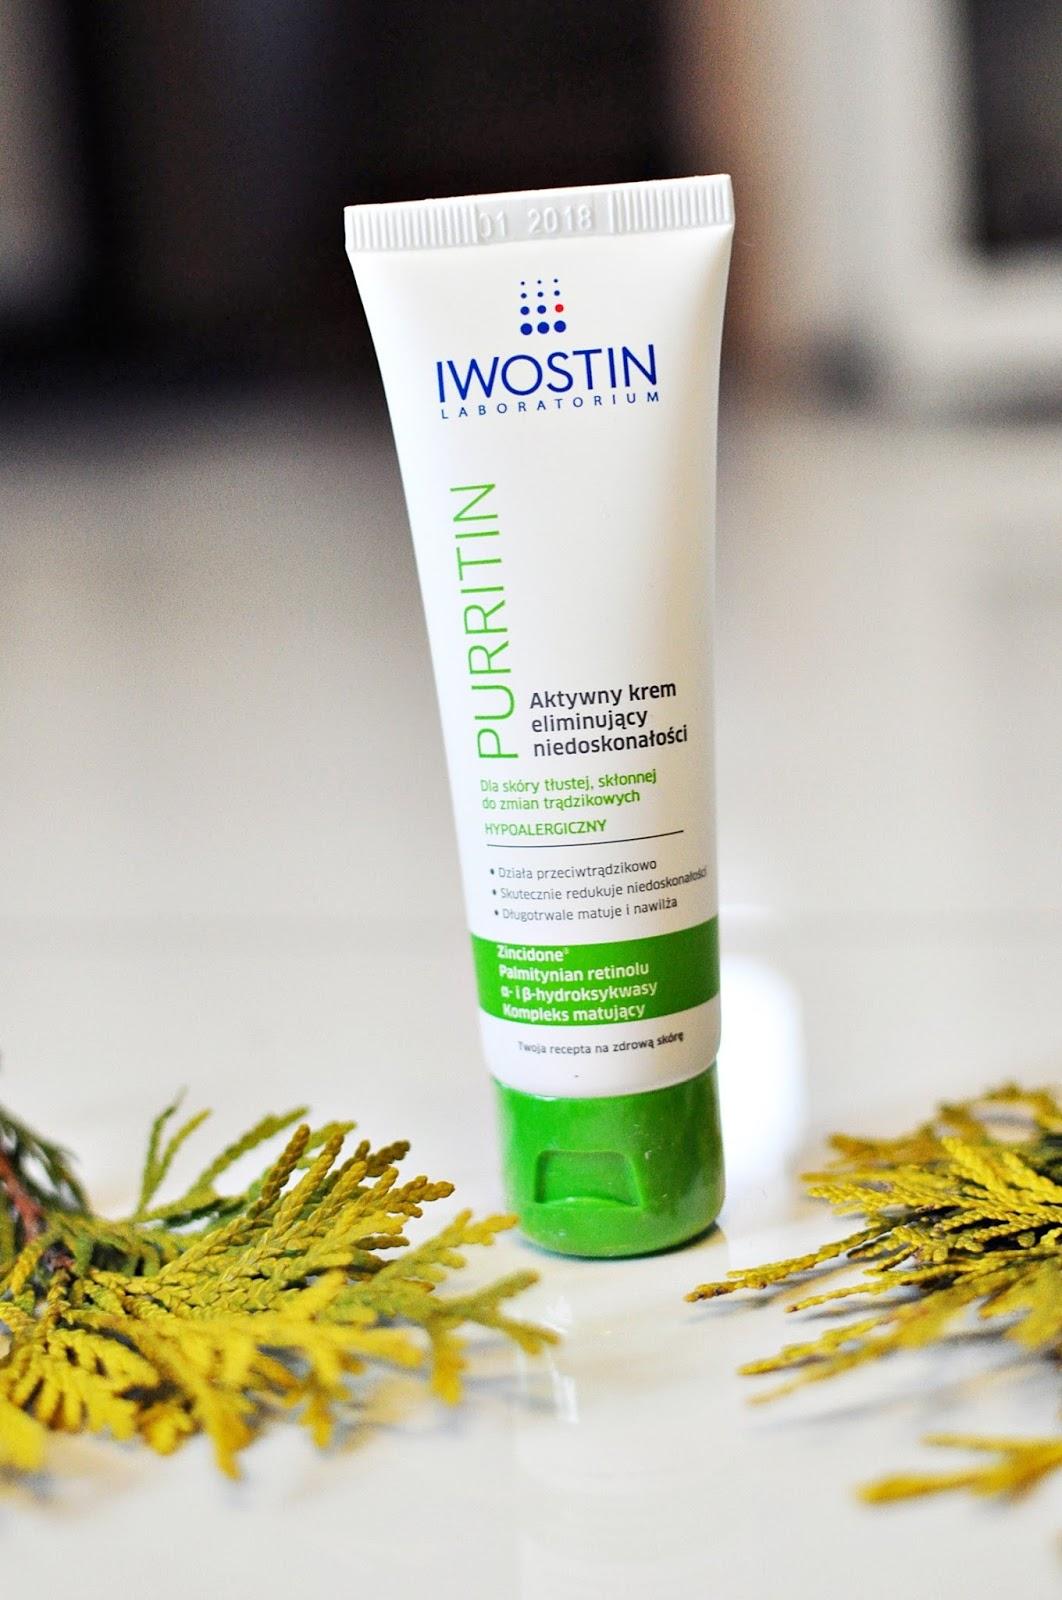 kosmetyki_iwostin_krem-purritin_reklama-tv